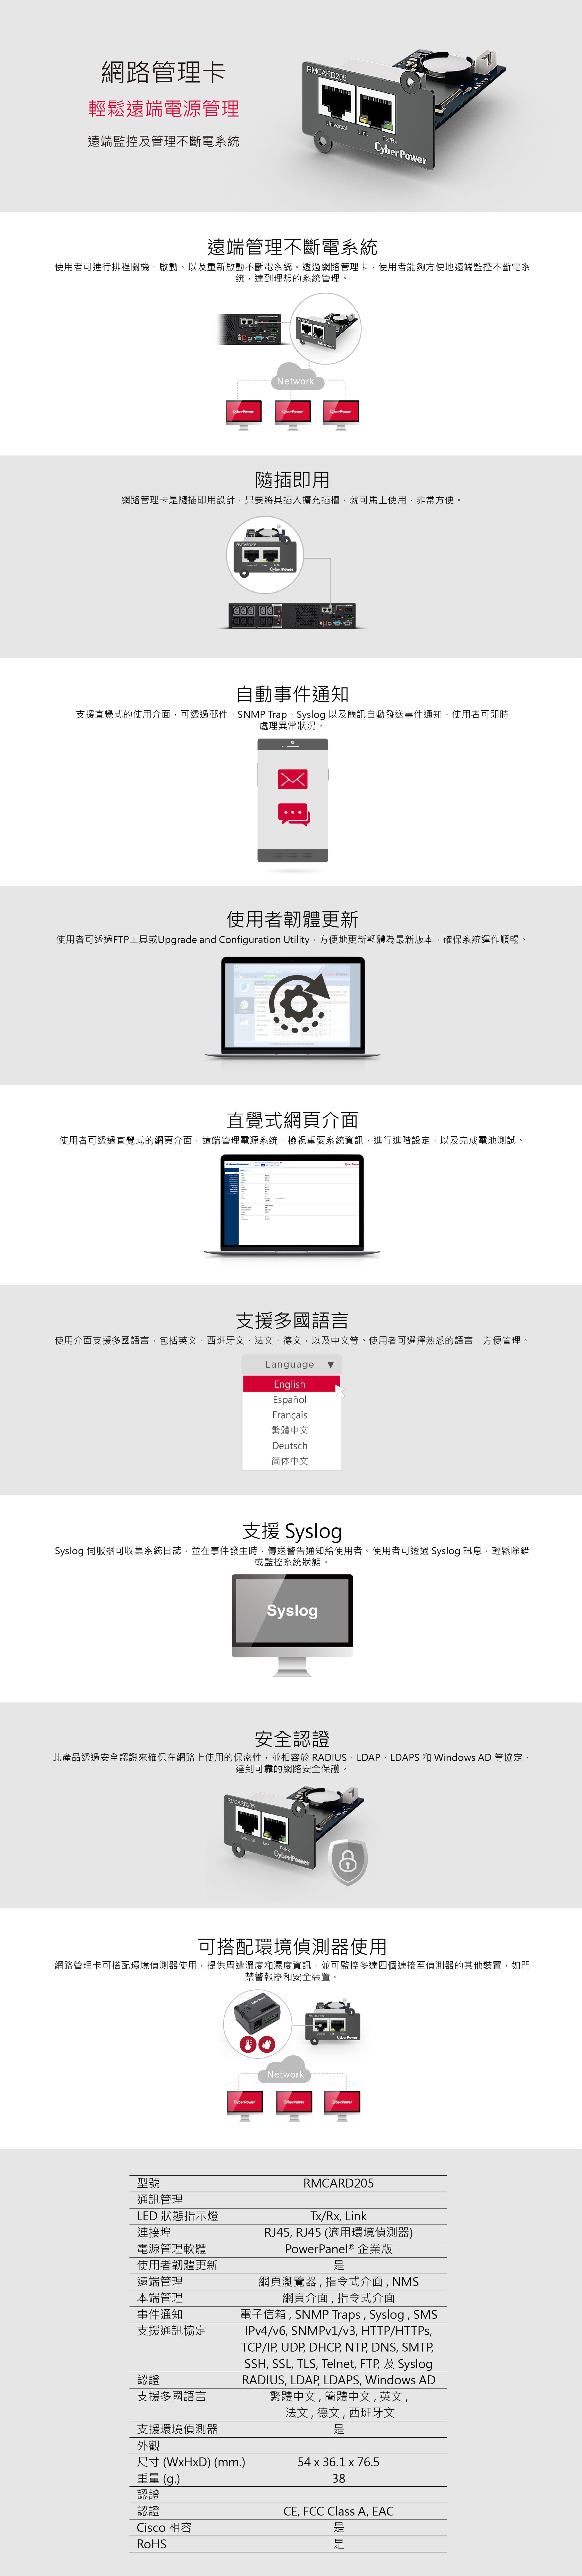 Cyberpower RMCARD205 網路管理卡商品介紹